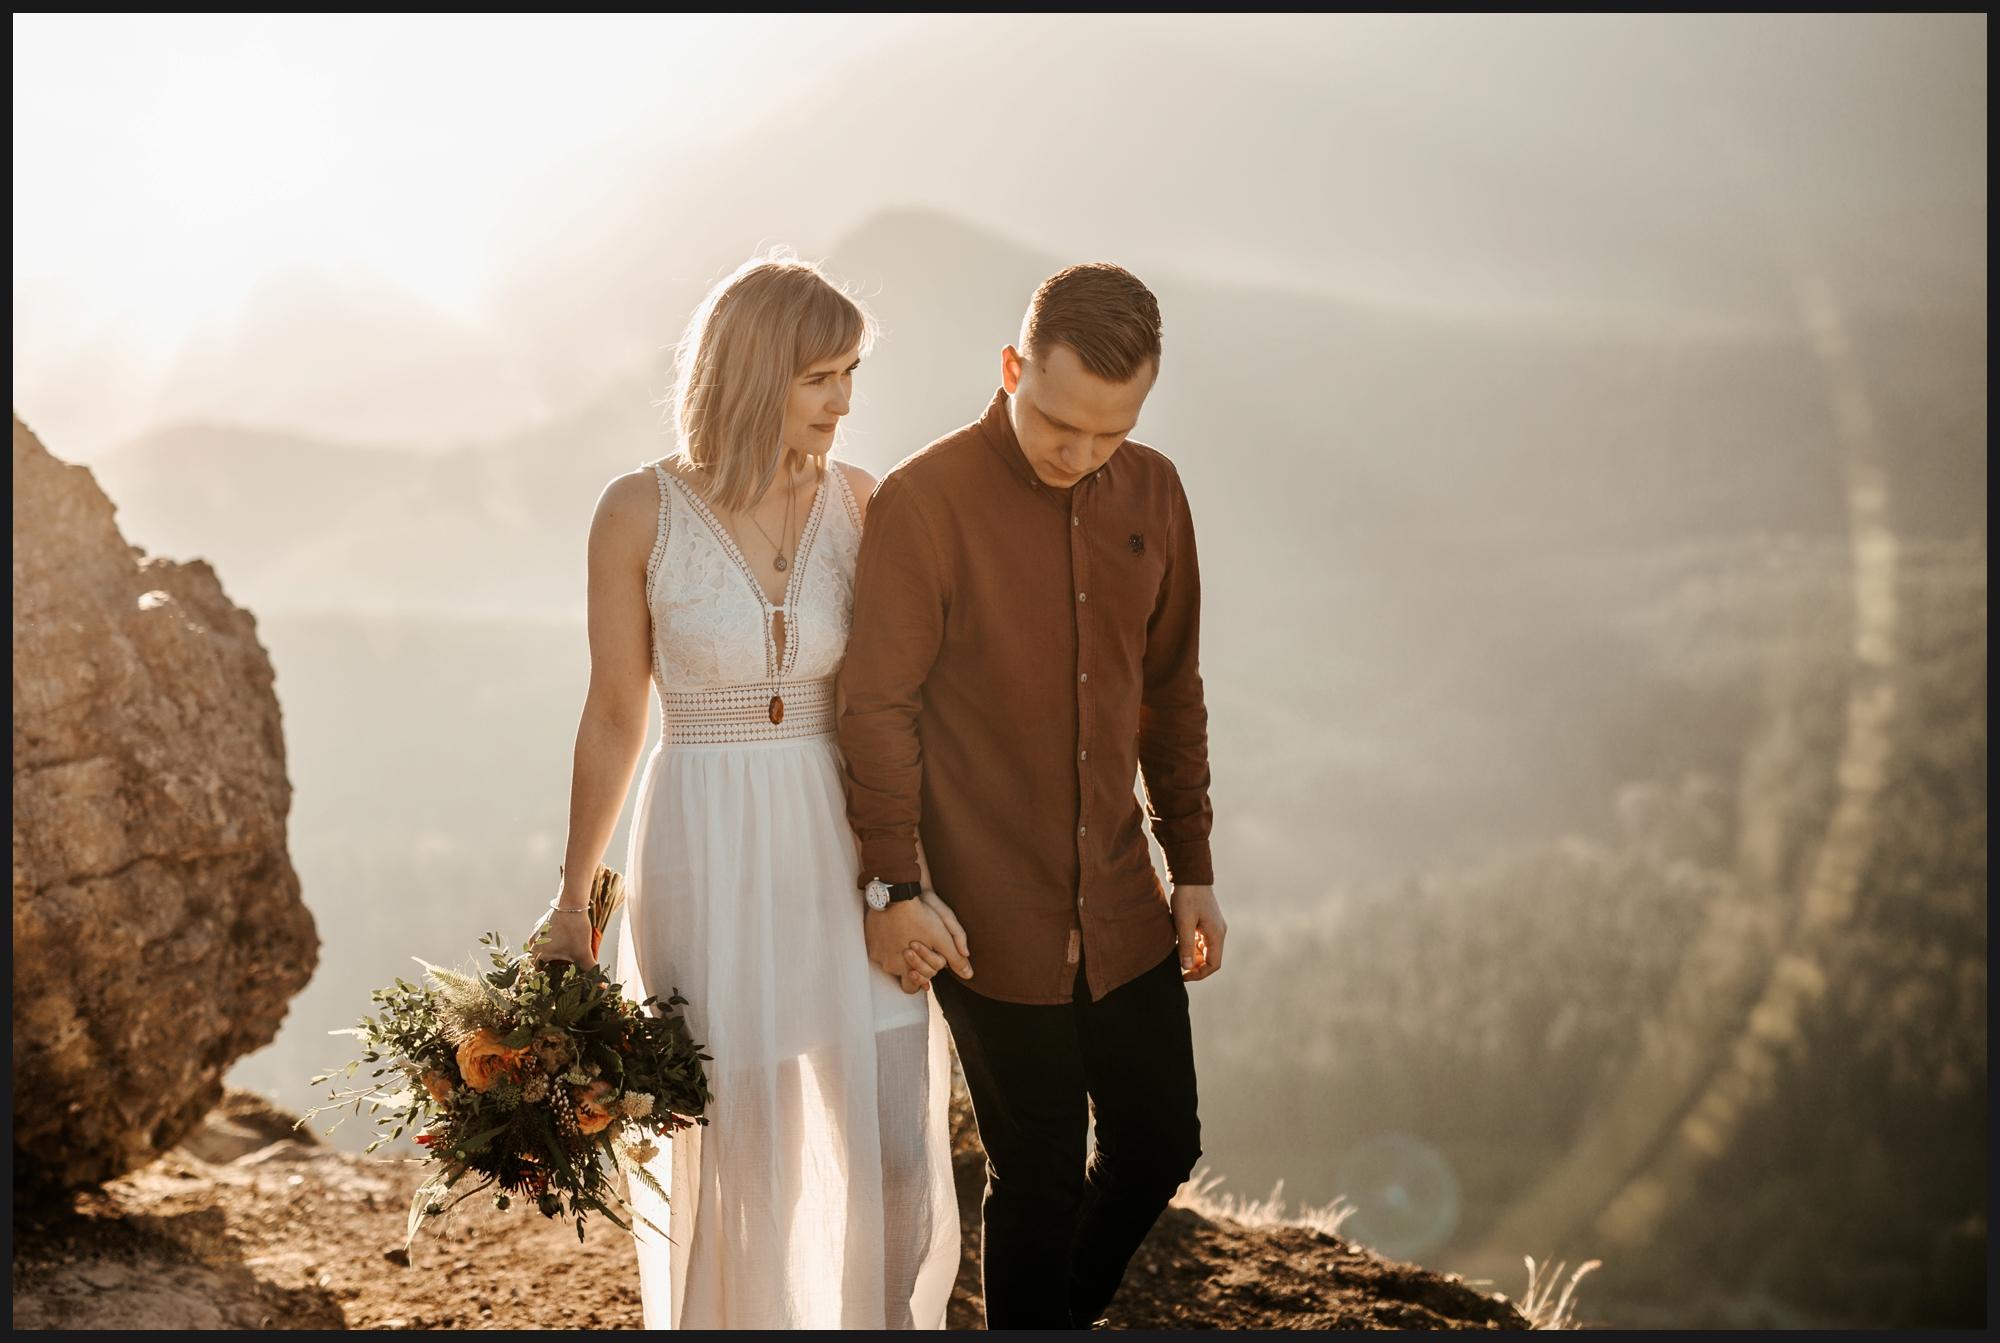 Orlando-Wedding-Photographer-destination-wedding-photographer-florida-wedding-photographer-bohemian-wedding-photographer_0443.jpg